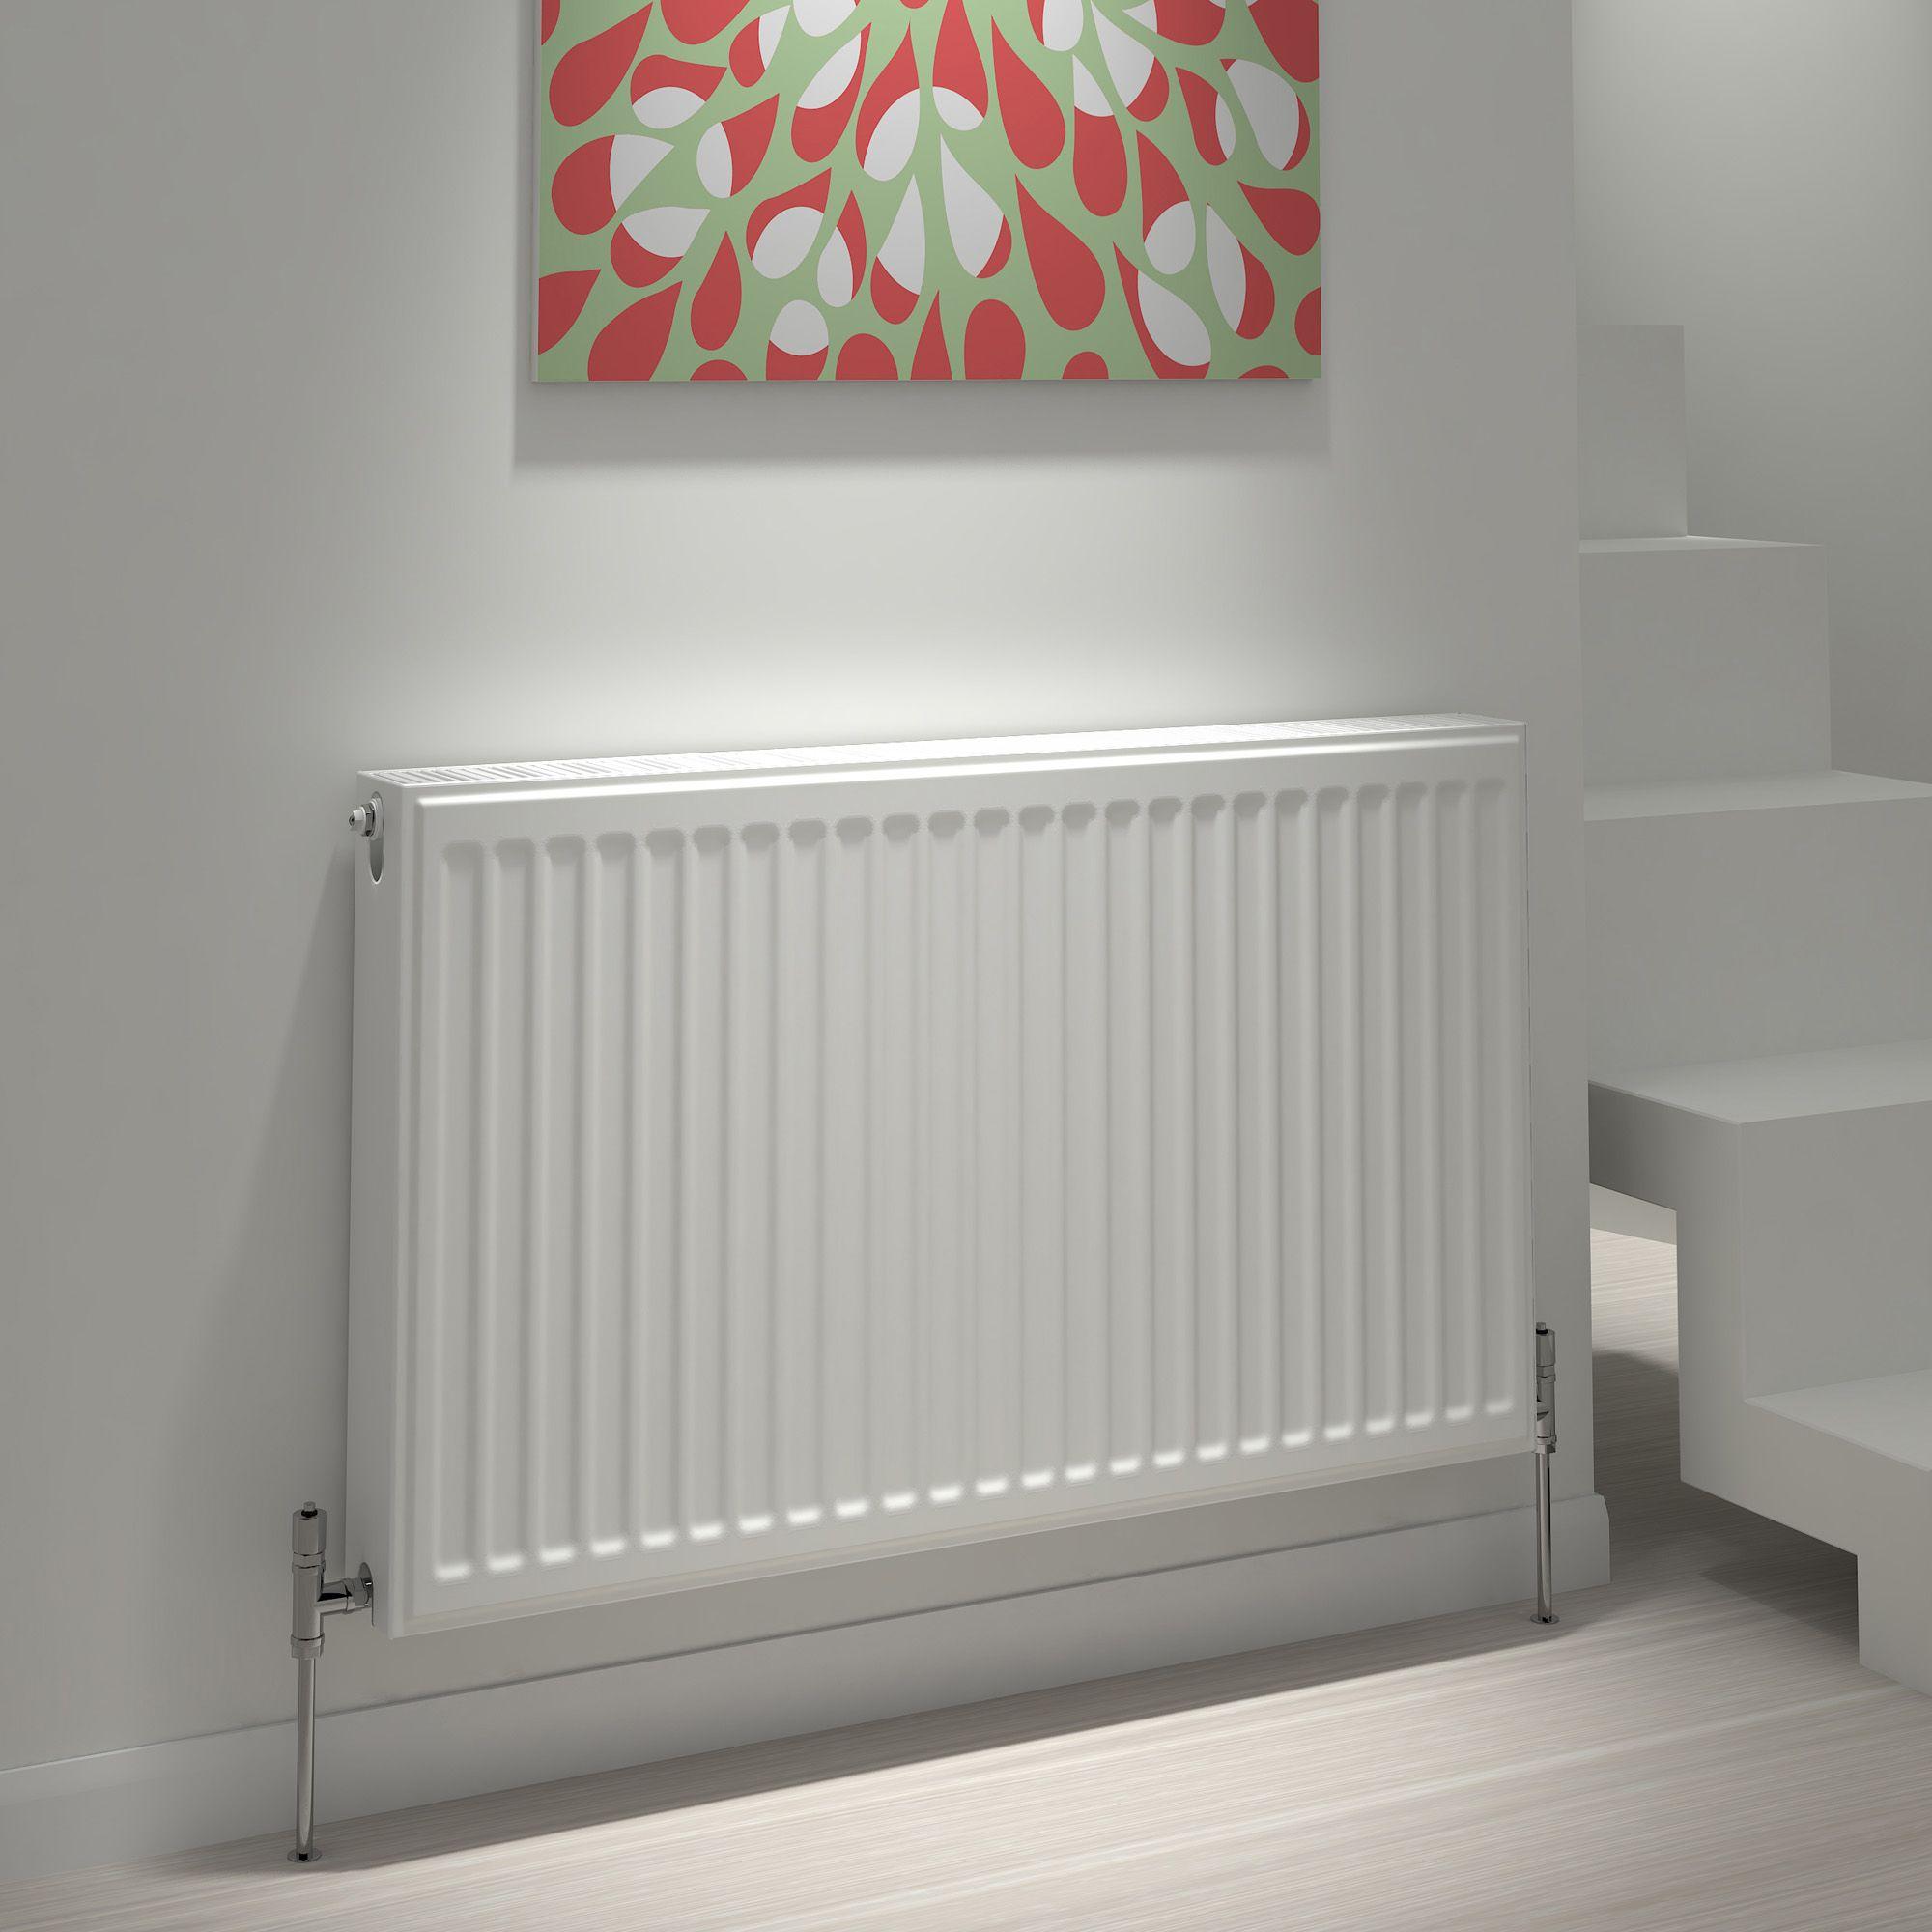 Kudox Type 11 single Panel radiator White, (H)500mm